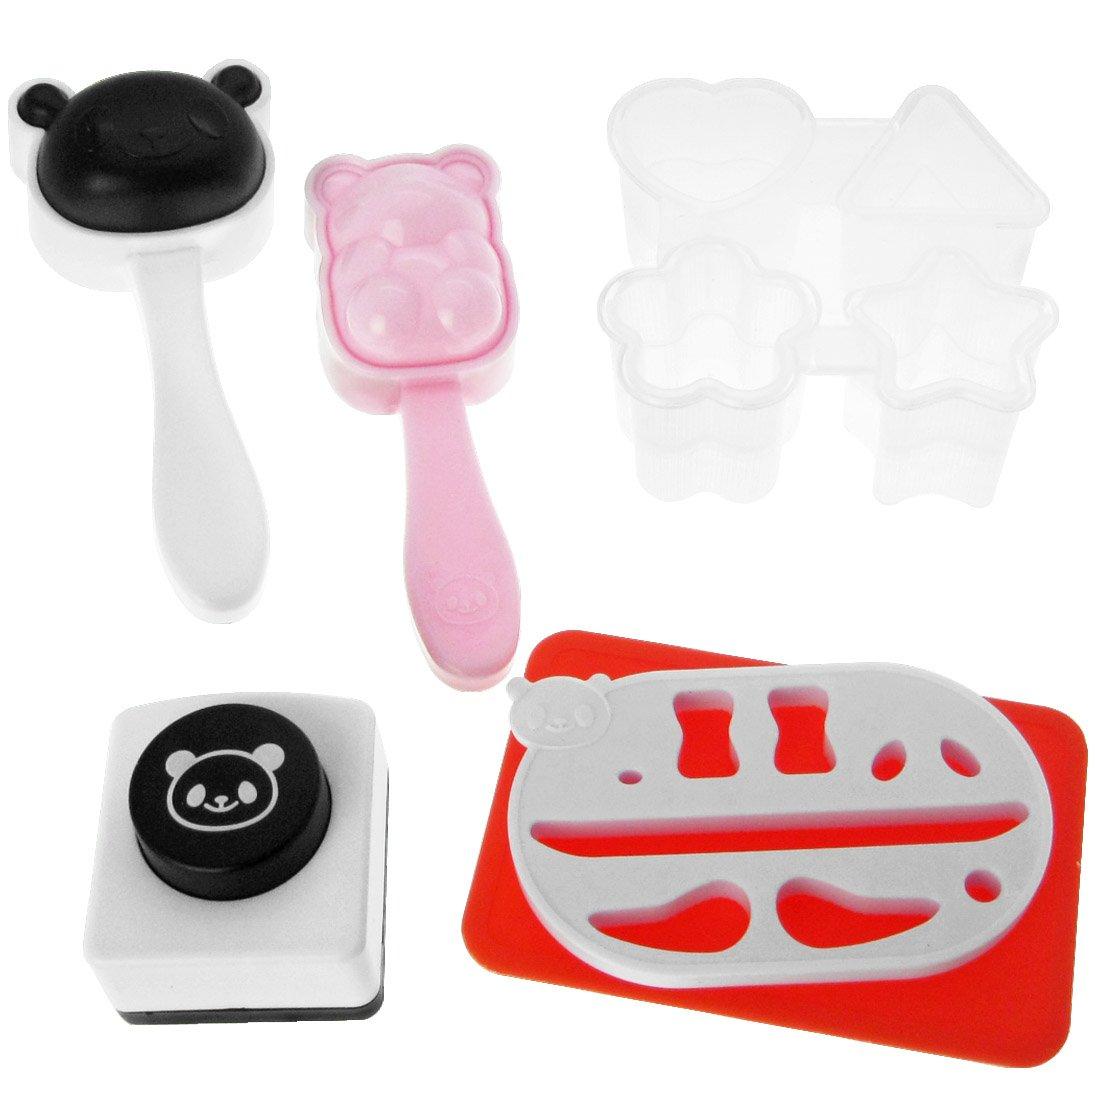 kilofly 2 Bento Rice Ball Mold with Seaweed Nori Punch, Panda + Sushi Shaper Kit AX-AY-ABHI-57596